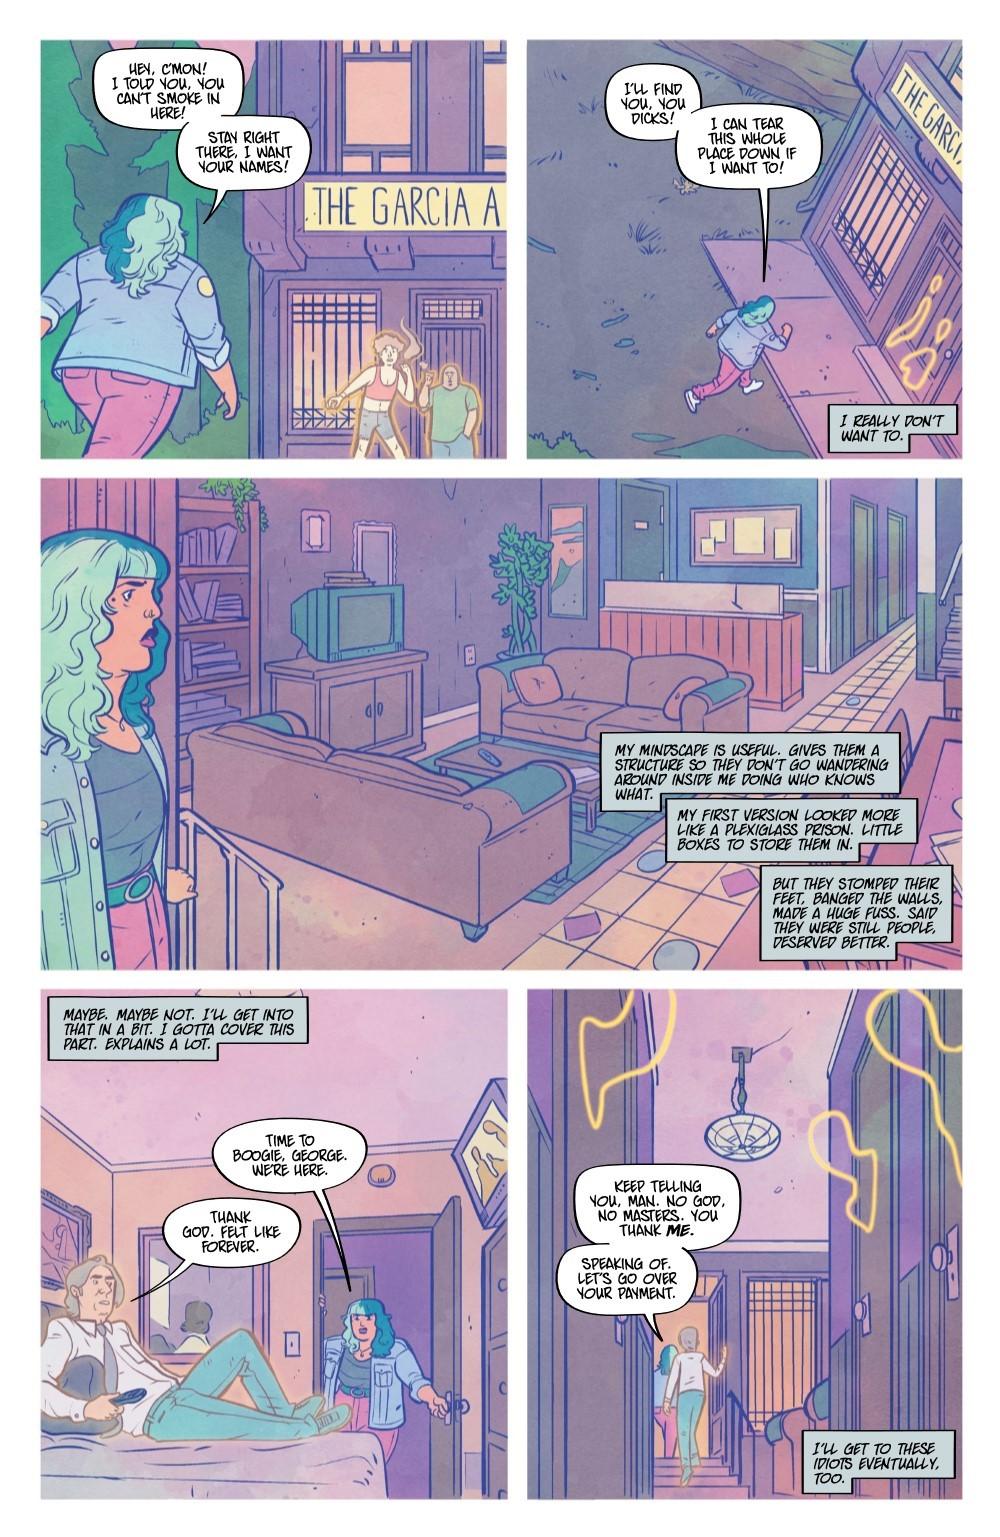 DIRTBAGRAPTURE1-MARKETING-05 ComicList Previews: DIRTBAG RAPTURE #1